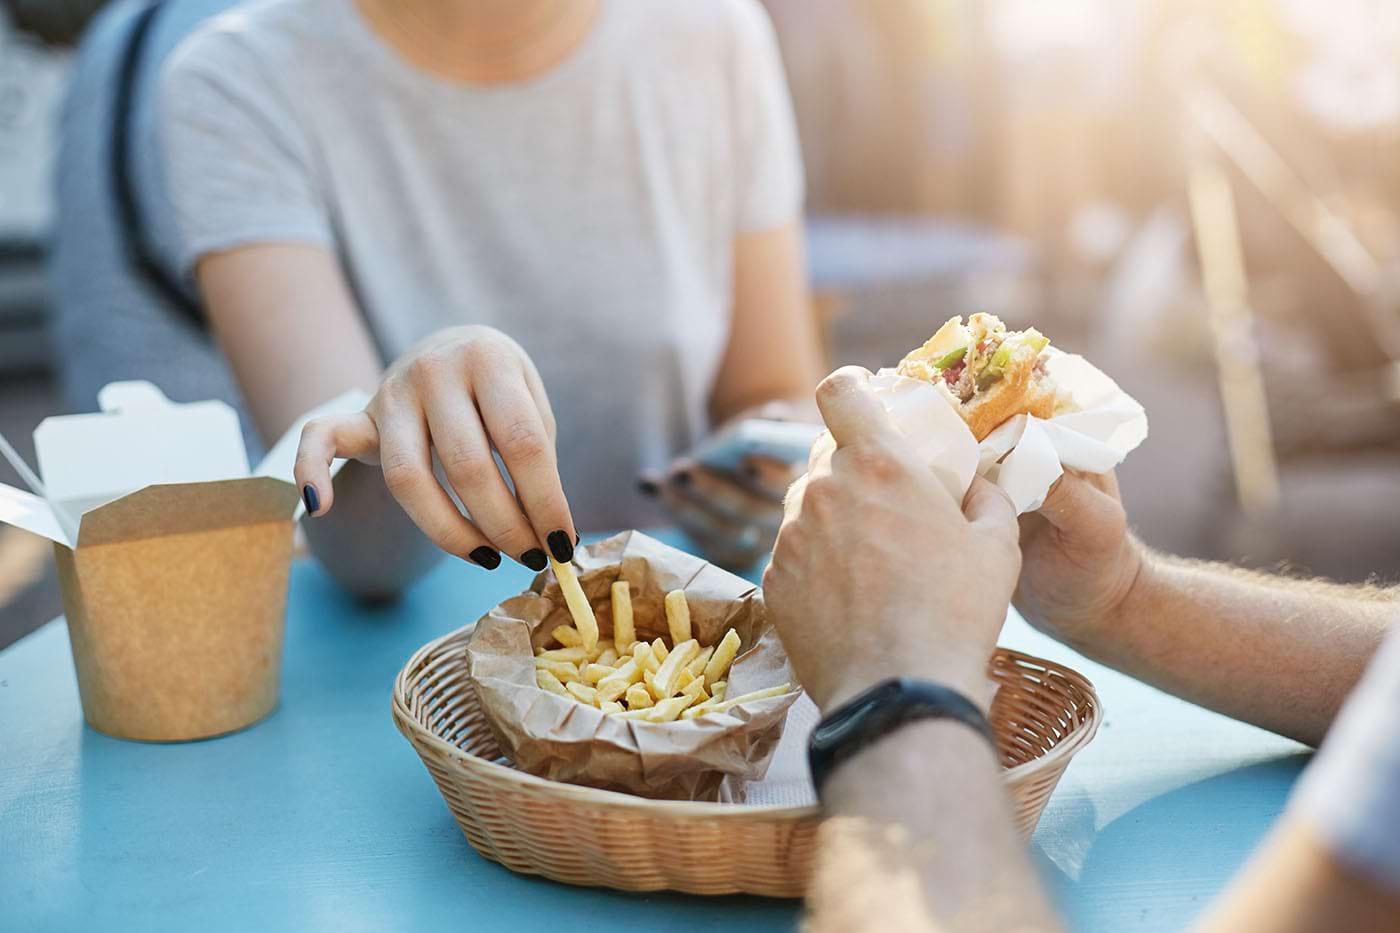 Multe boli cronice, conectate cu consumul de alimente inflamatorii